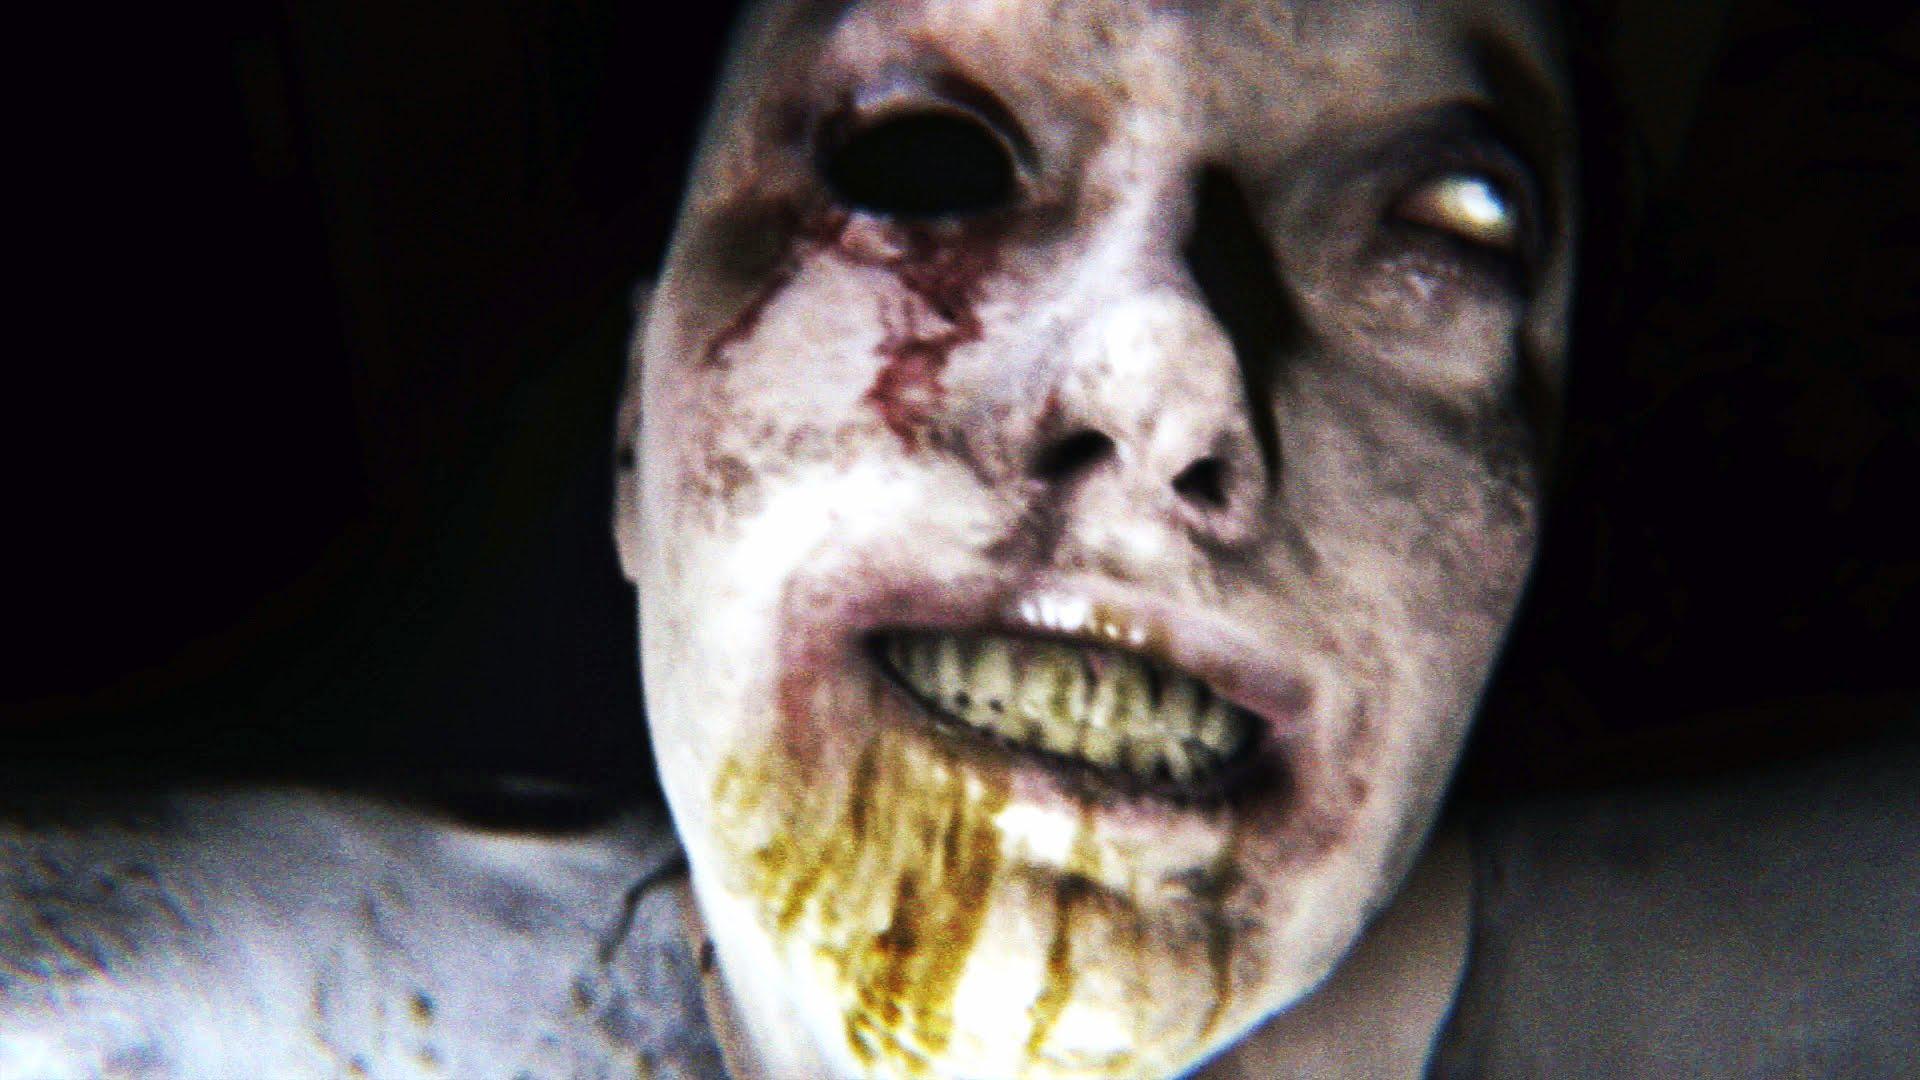 #TGS14: Silent Hills